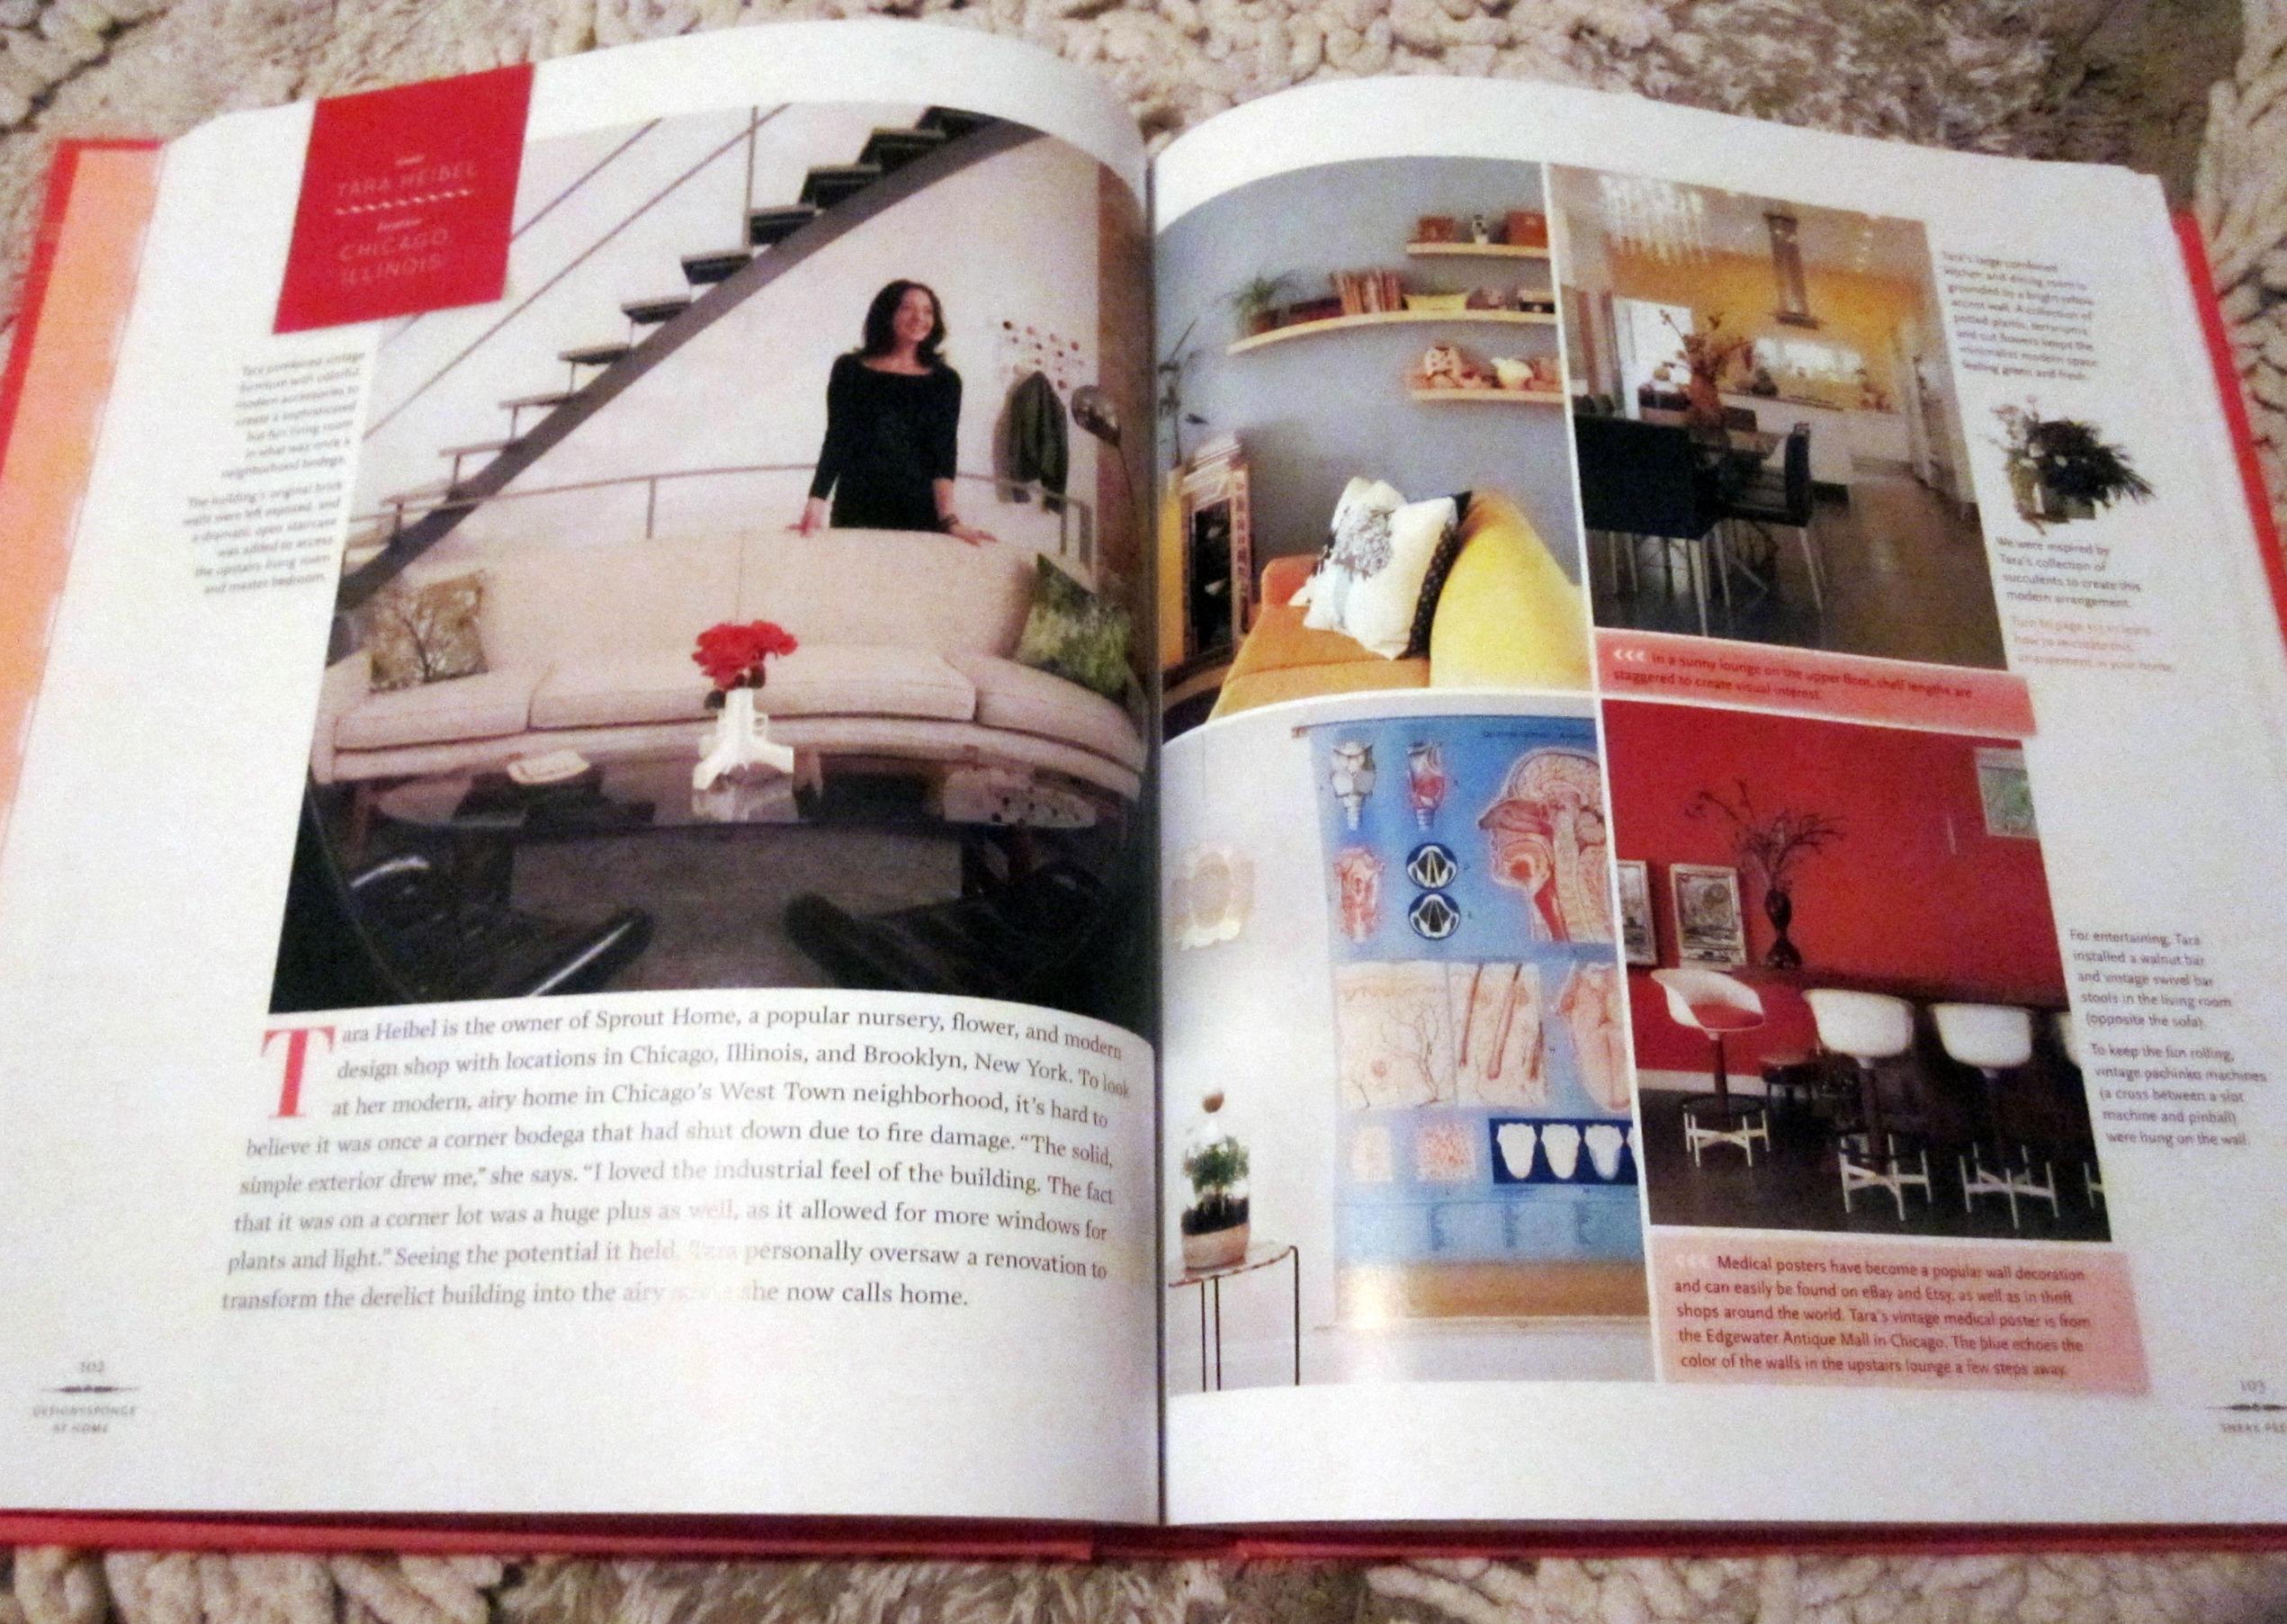 Design sponge at home book | Home design